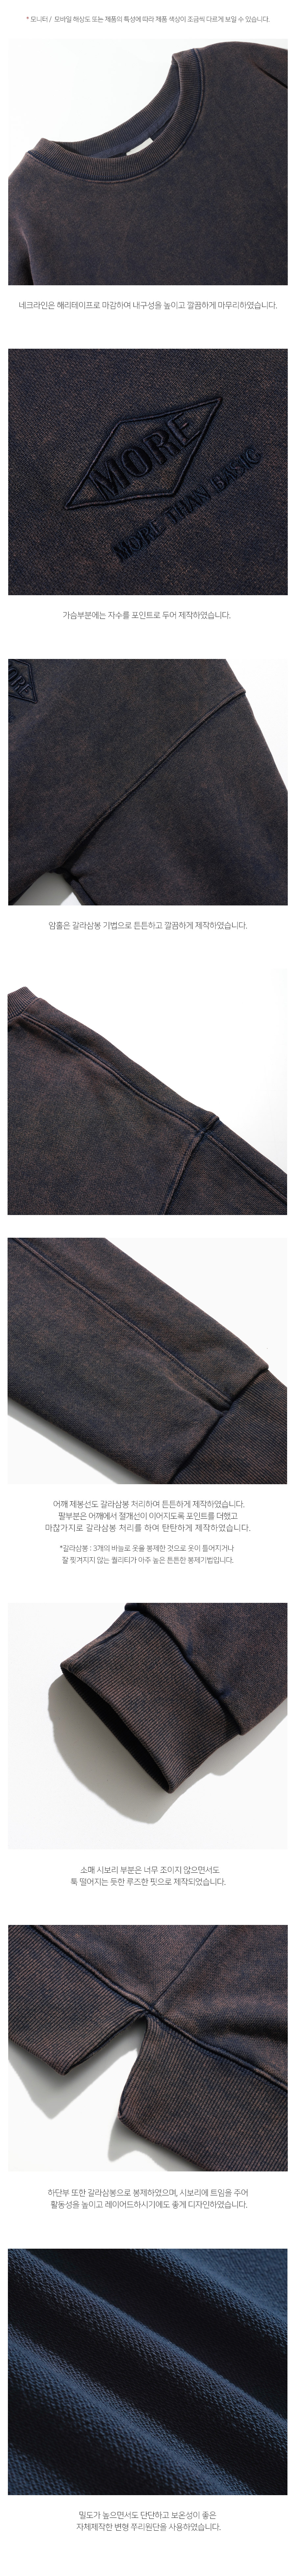 5_SJMT1289_detail_charcoal3_hj.jpg